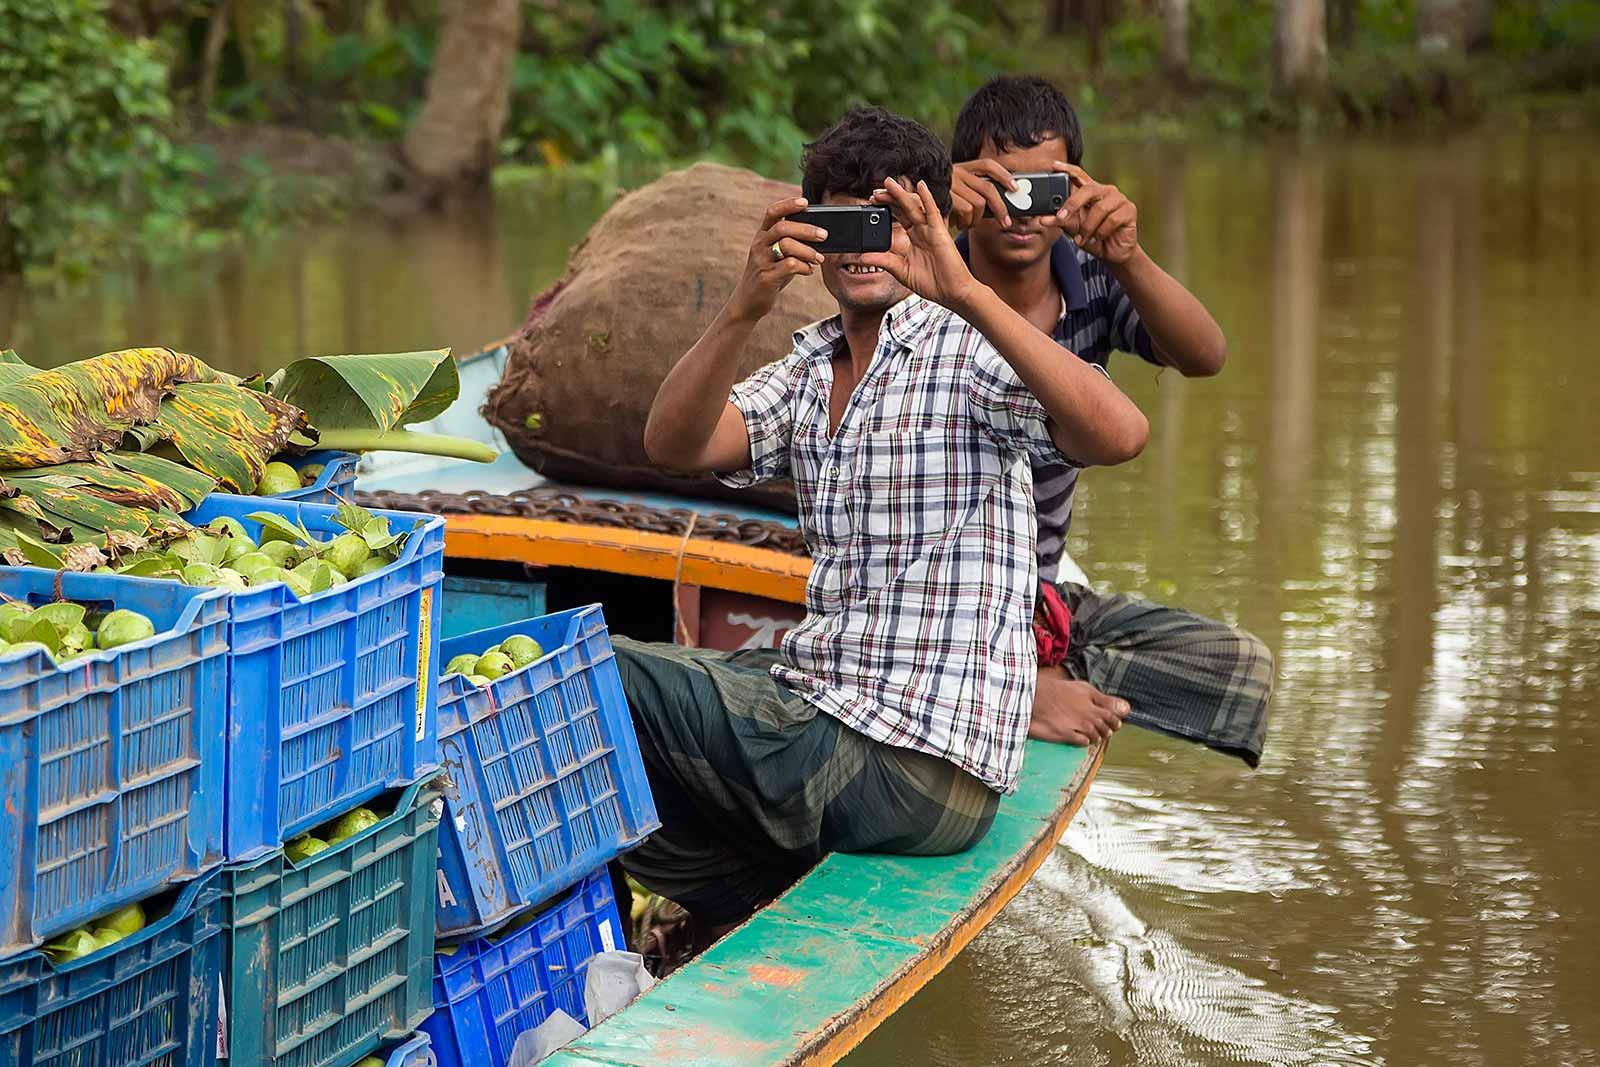 guava-plantations-boat-canal-swarupkathi-bangladesh-5